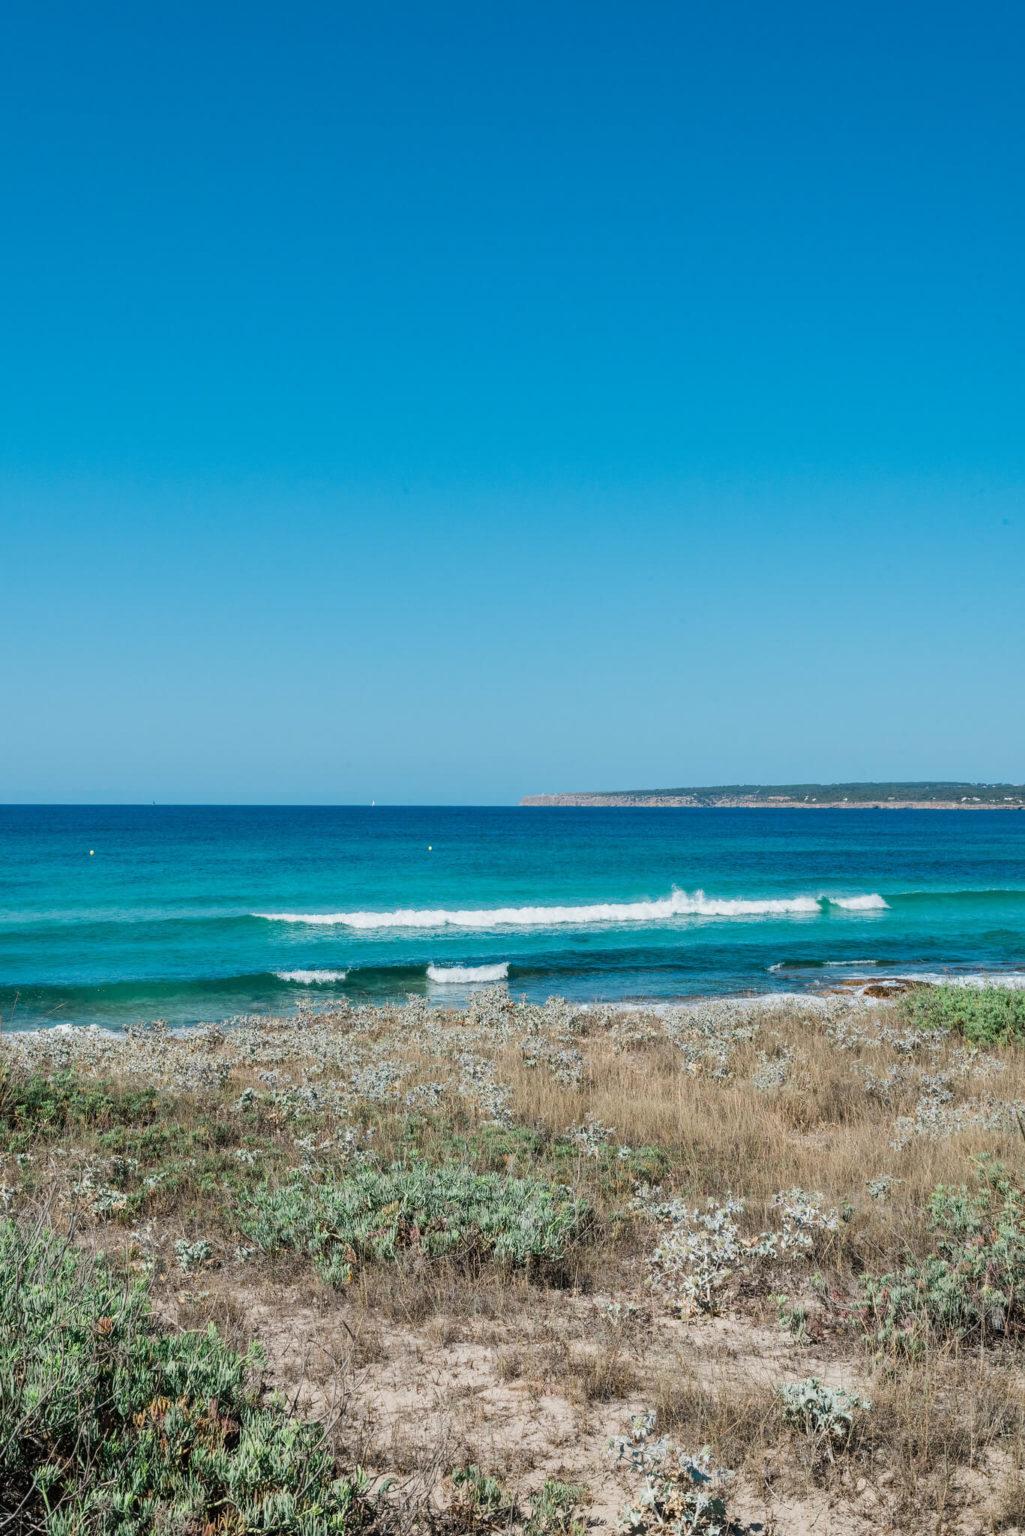 https://www.white-ibiza.com/wp-content/uploads/2020/03/formentera-beaches-migjorn-2020-07-1025x1536.jpg